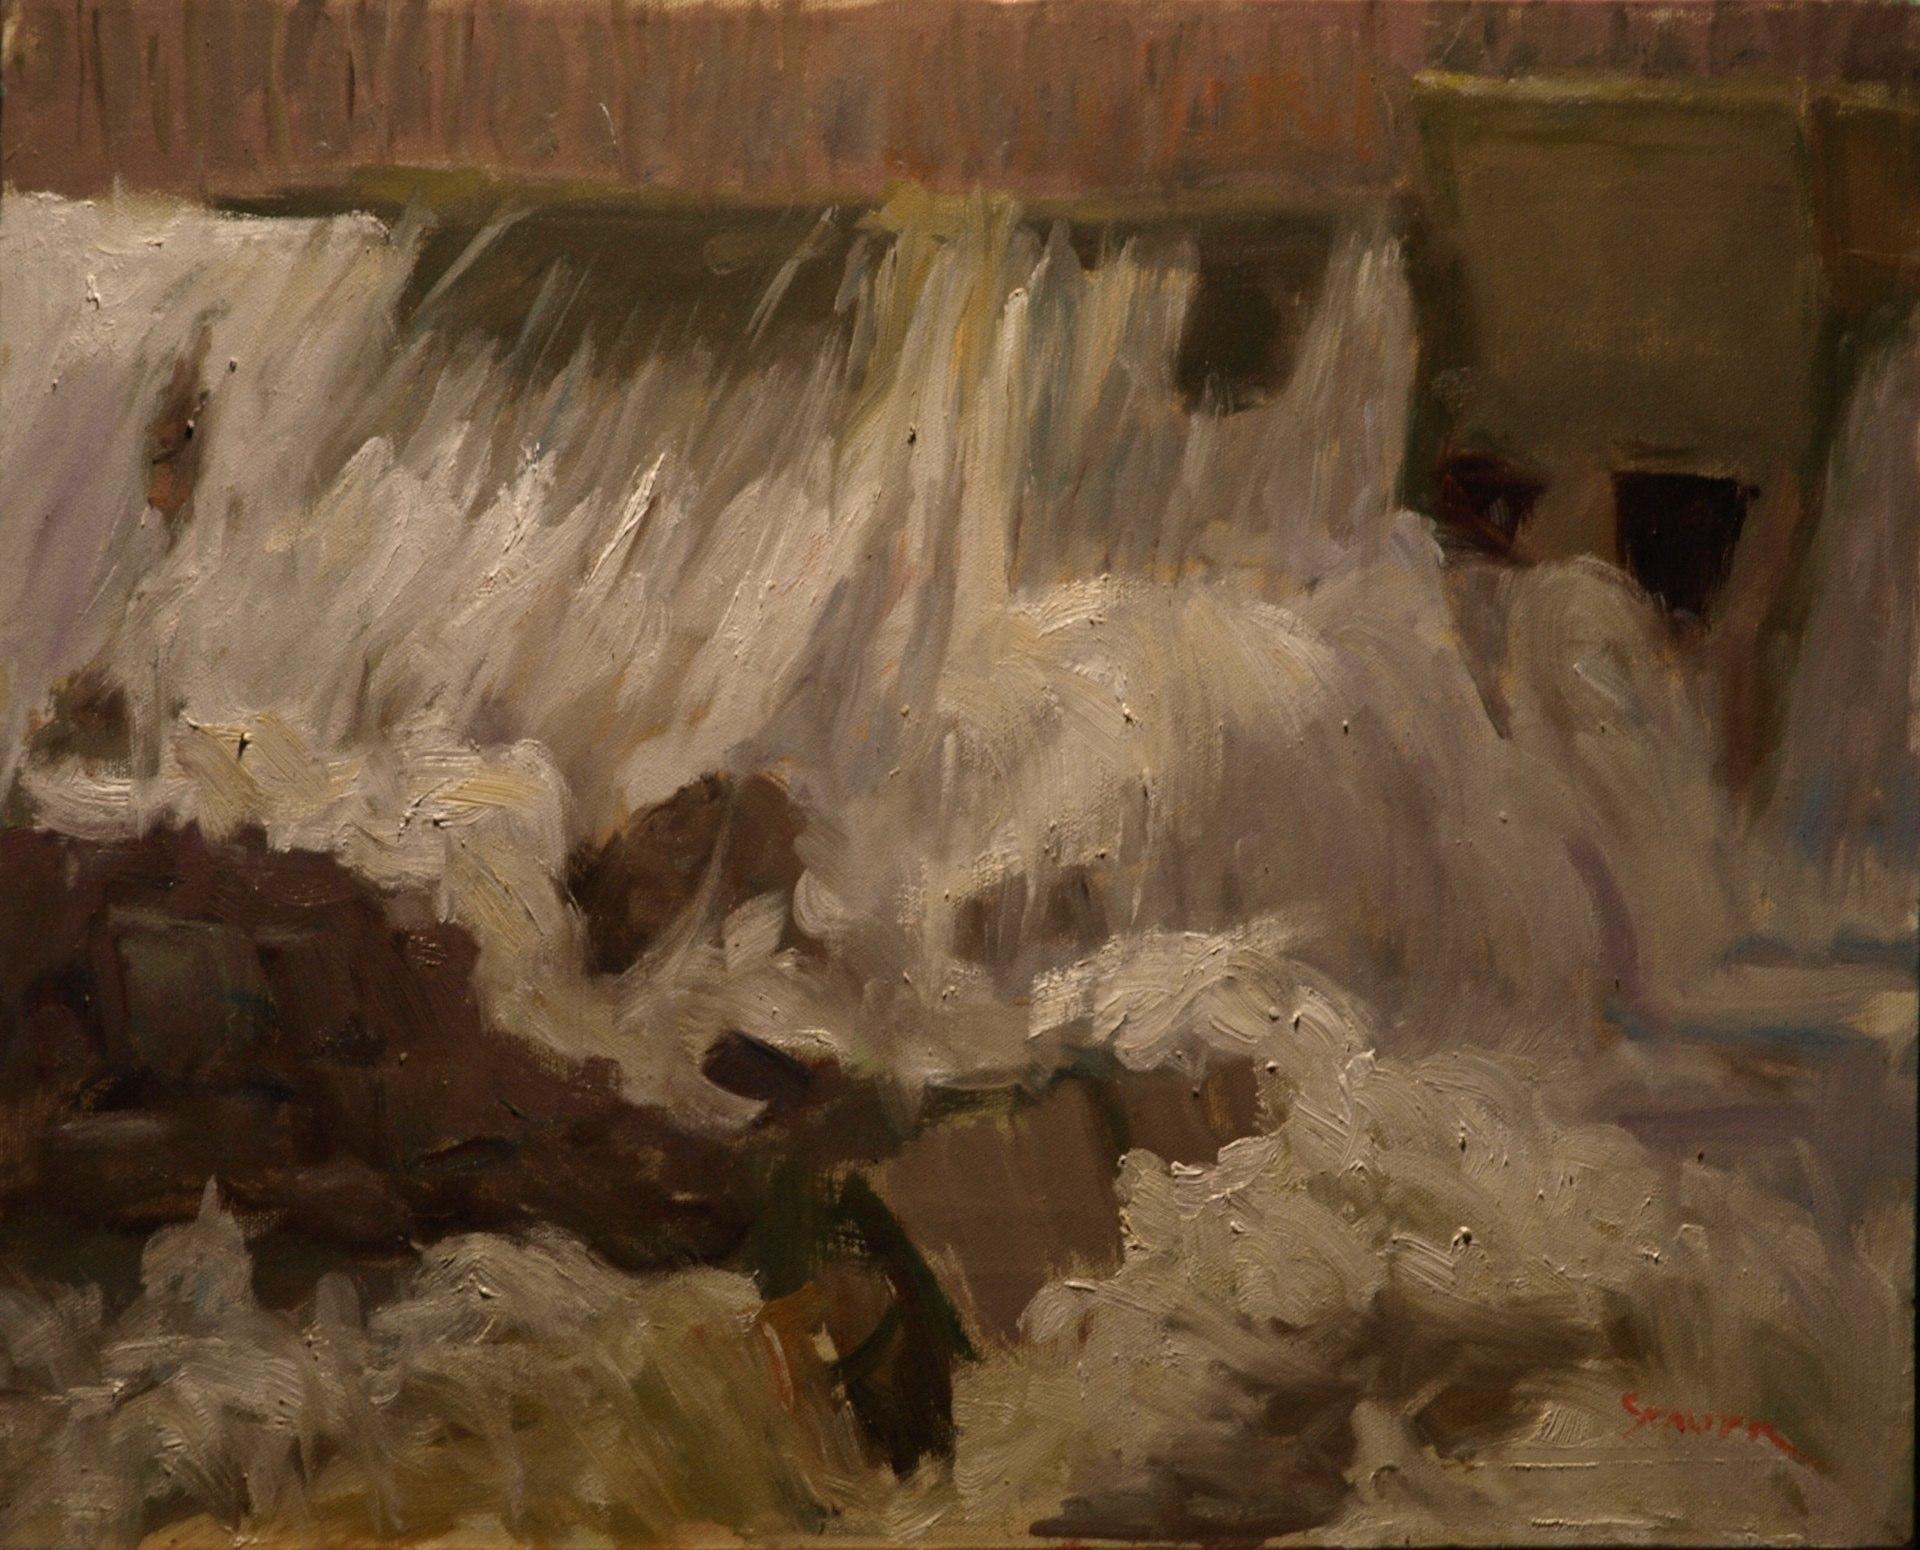 Bulls Bridge Dam Flood, Oil on Canvas, 16 x 20 Inches, by Richard Stalter, $425